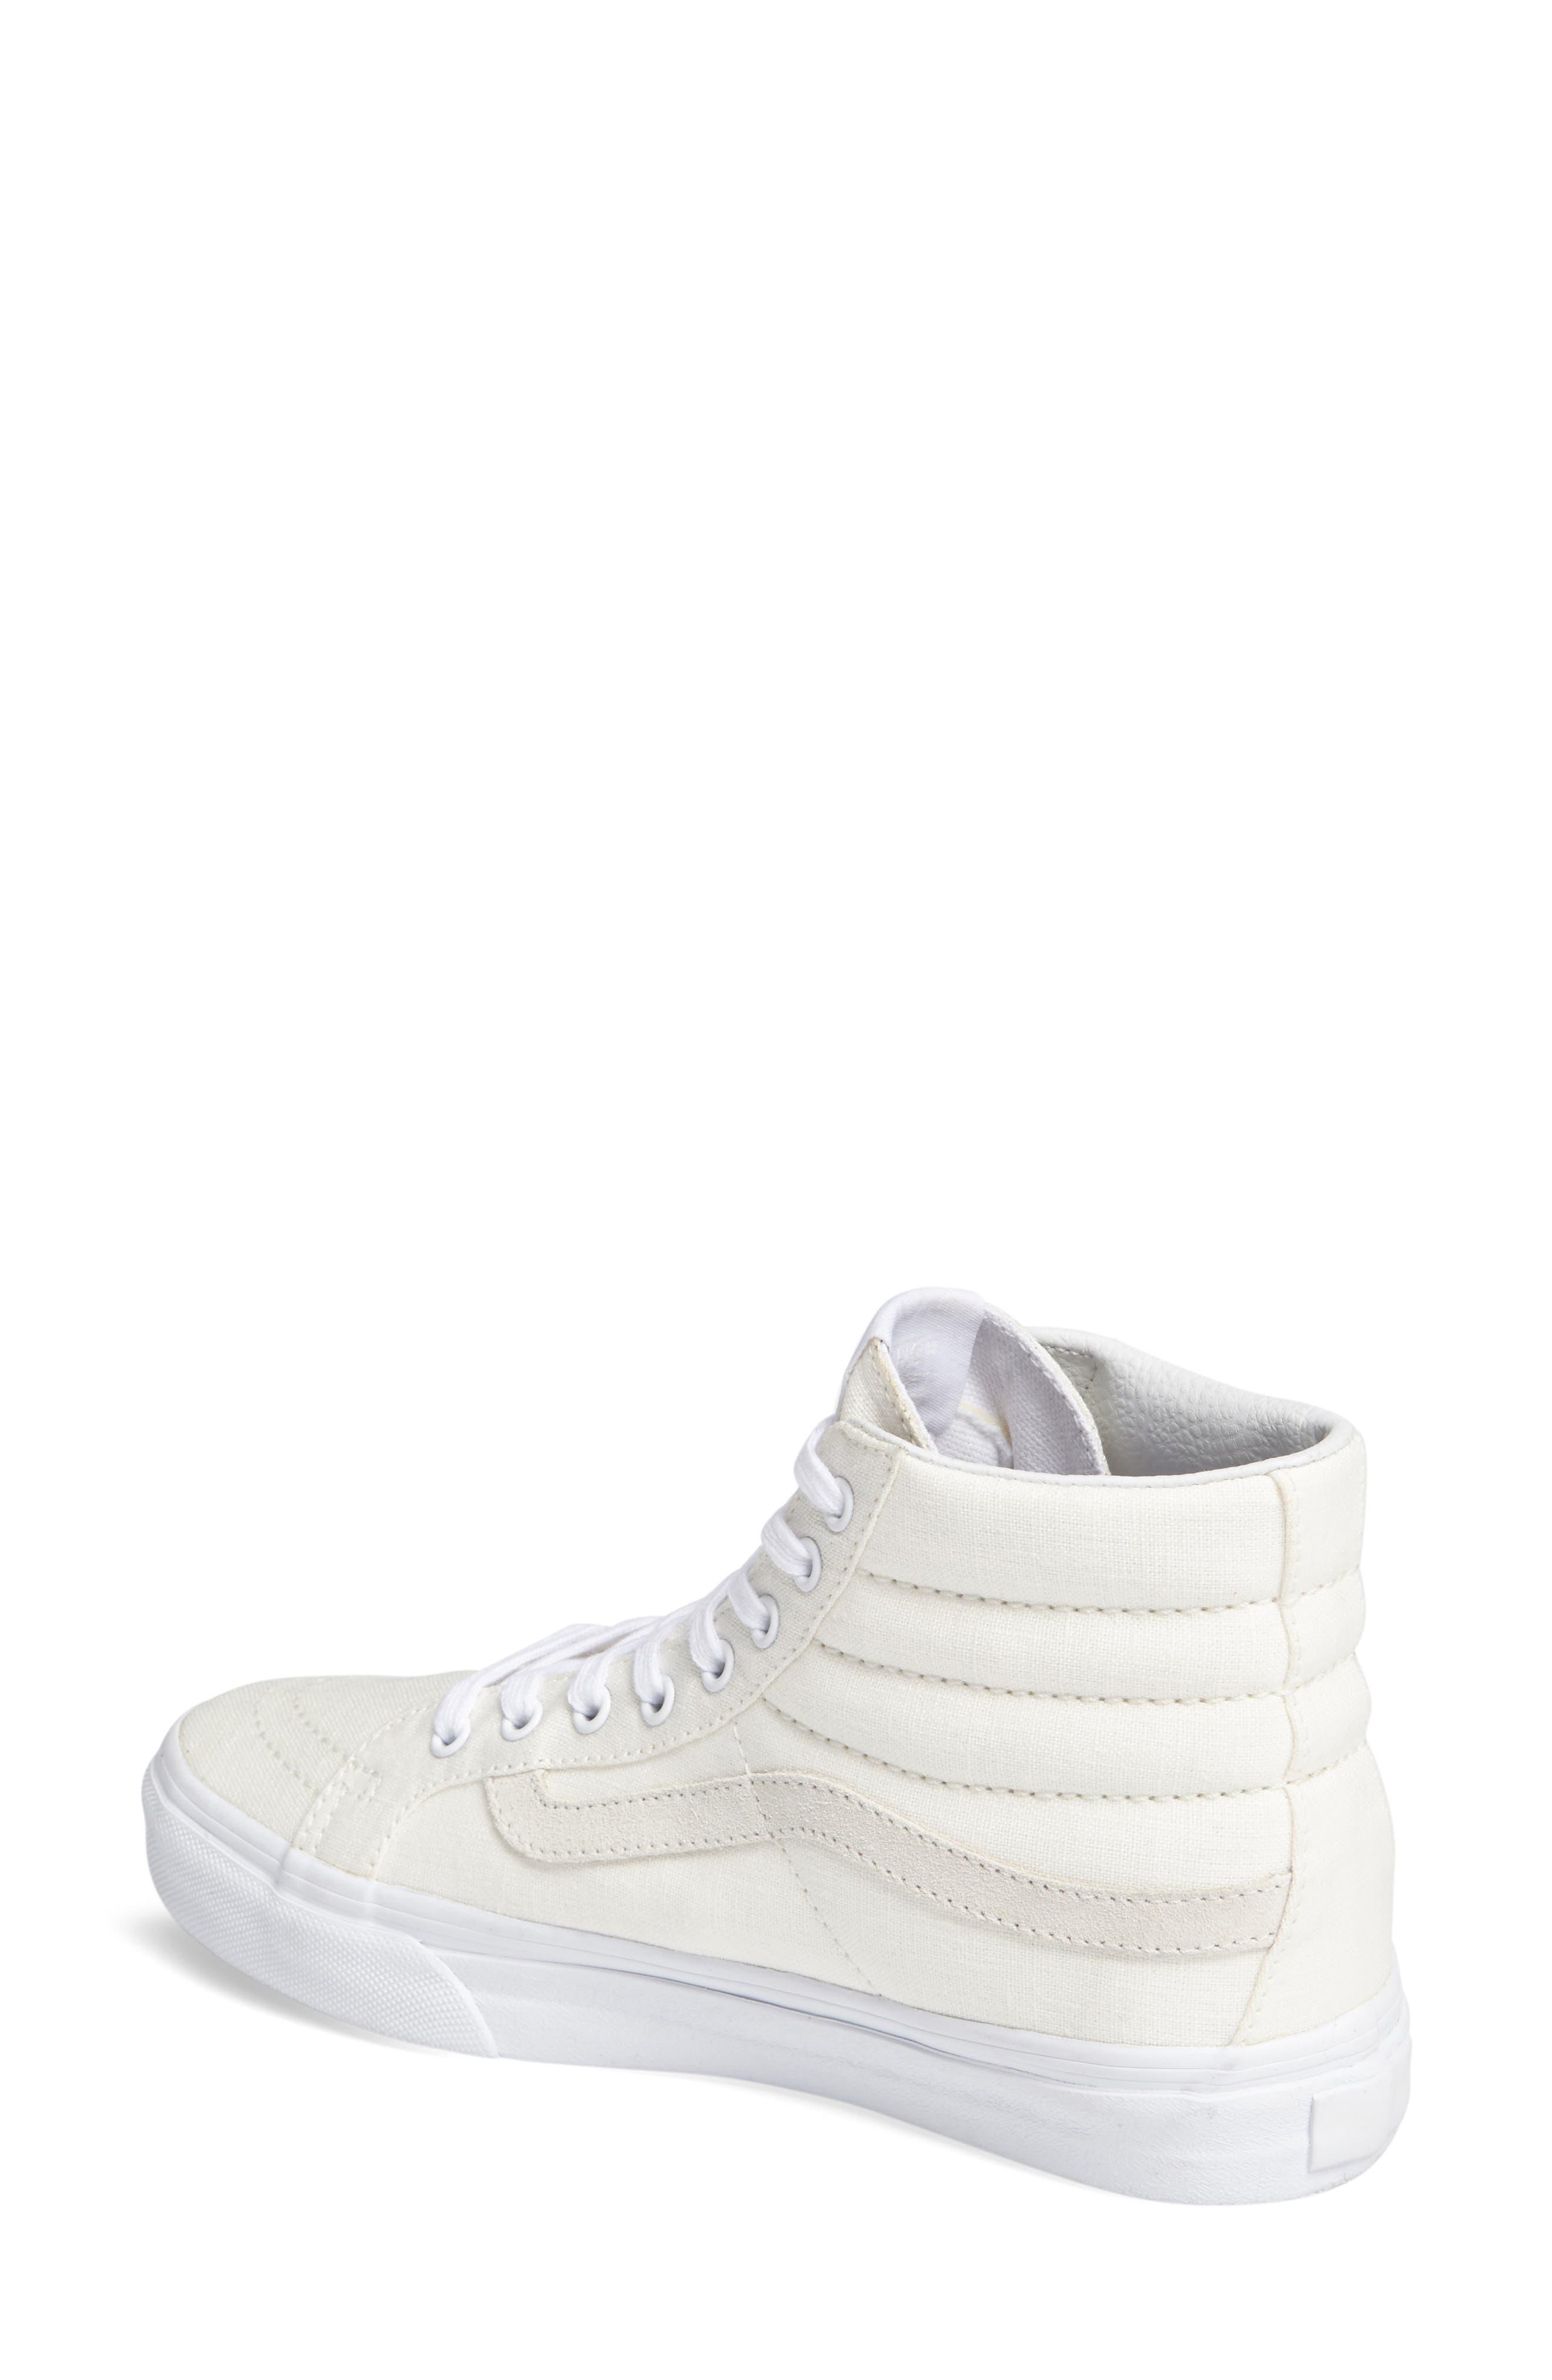 Alternate Image 2  - Vans Sk8-Hi Slim Sneaker (Women)